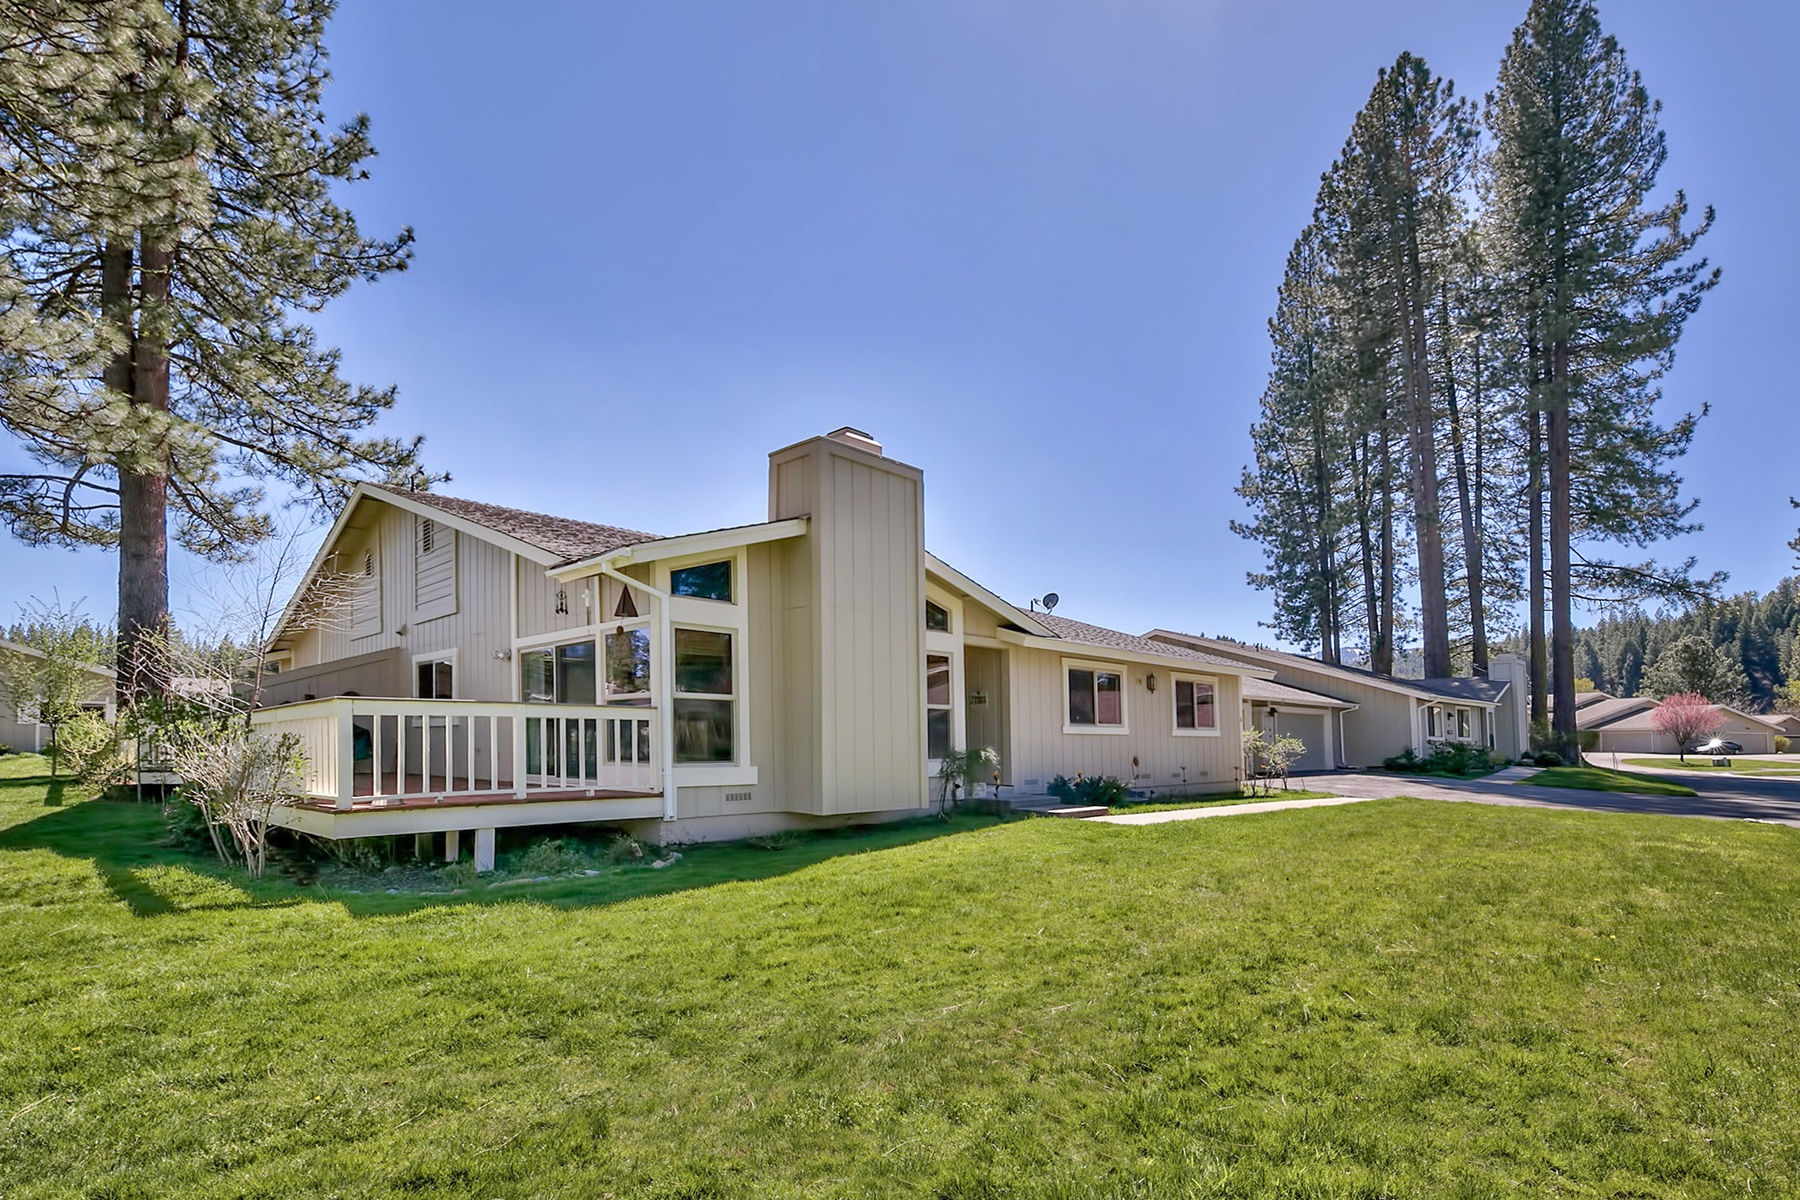 Condominium for Active at 76 W Ponderosa Drive, Blairsden, California 96103 Blairsden, California 96103 United States